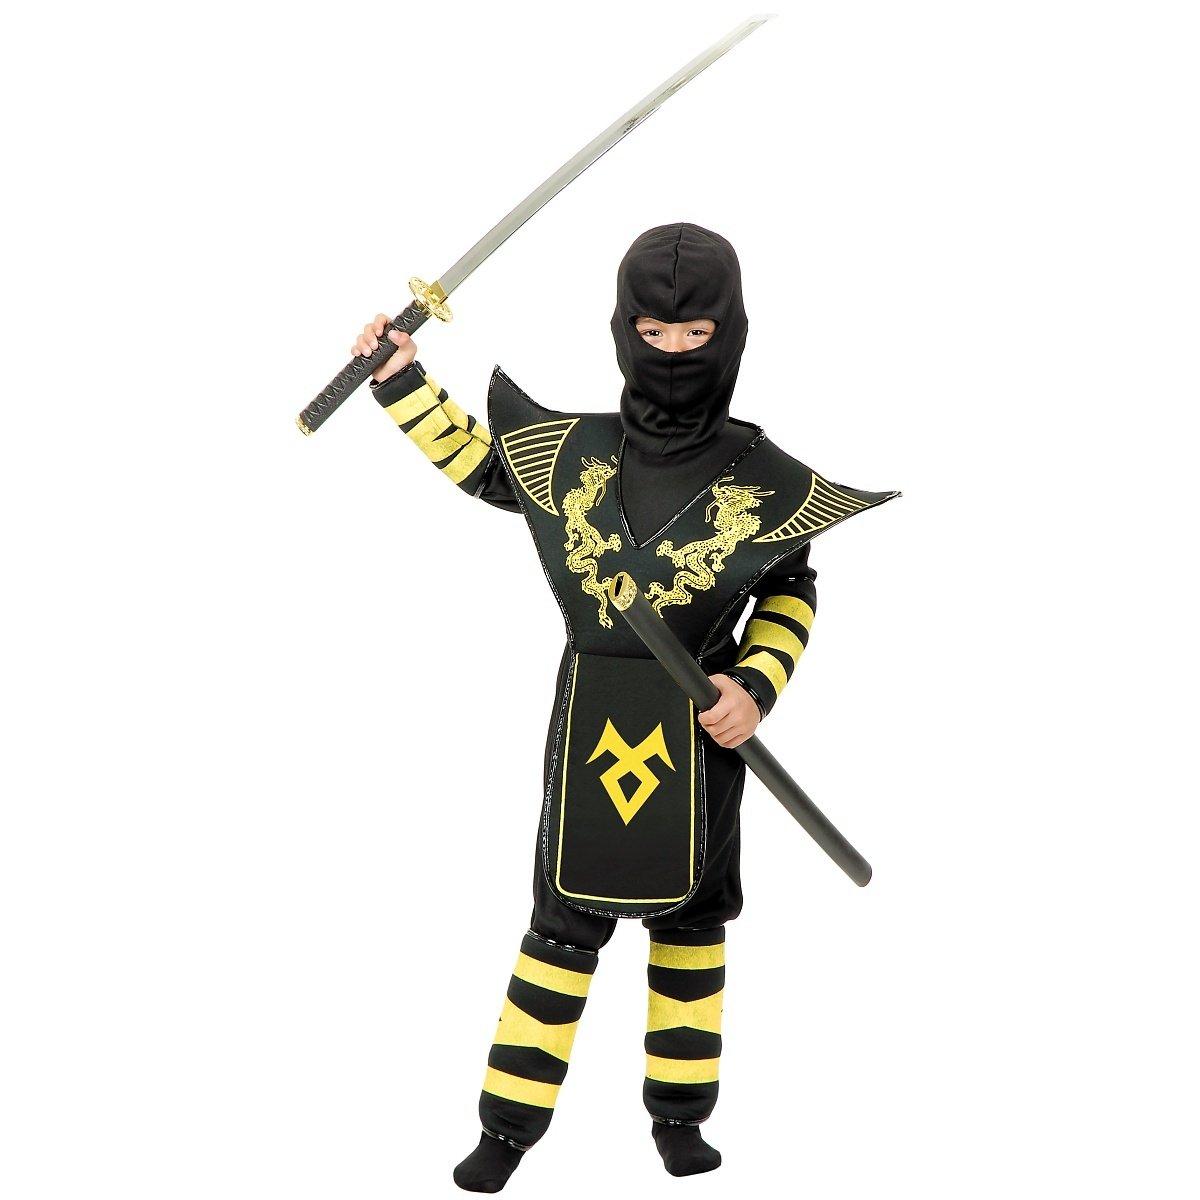 Golden Dragon Ninja Warrior Child Costume - Large